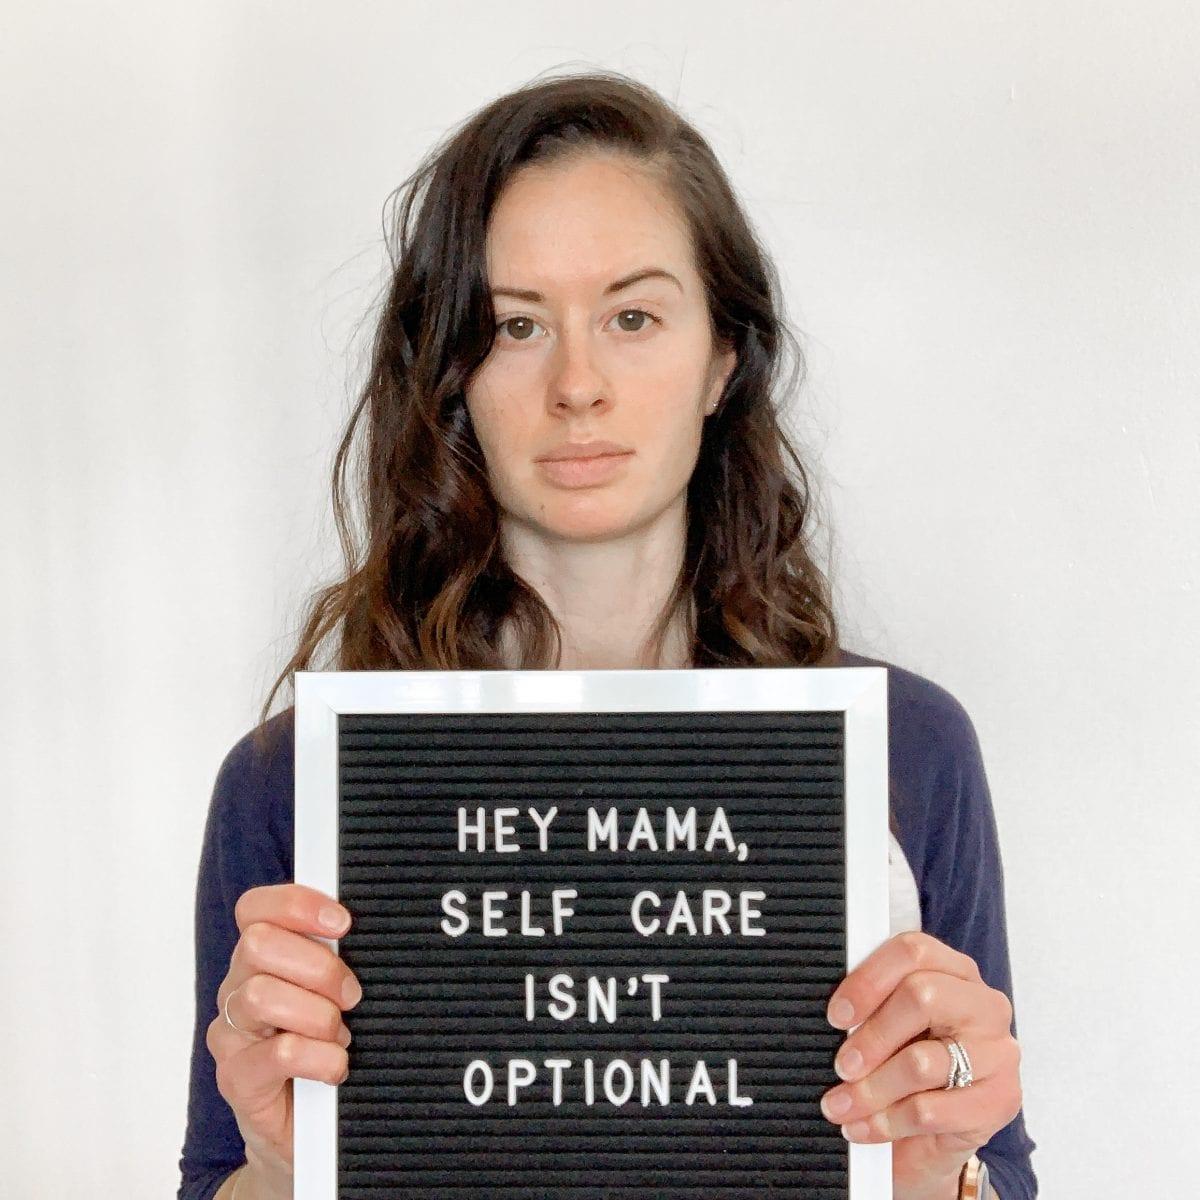 Self care isn't optional